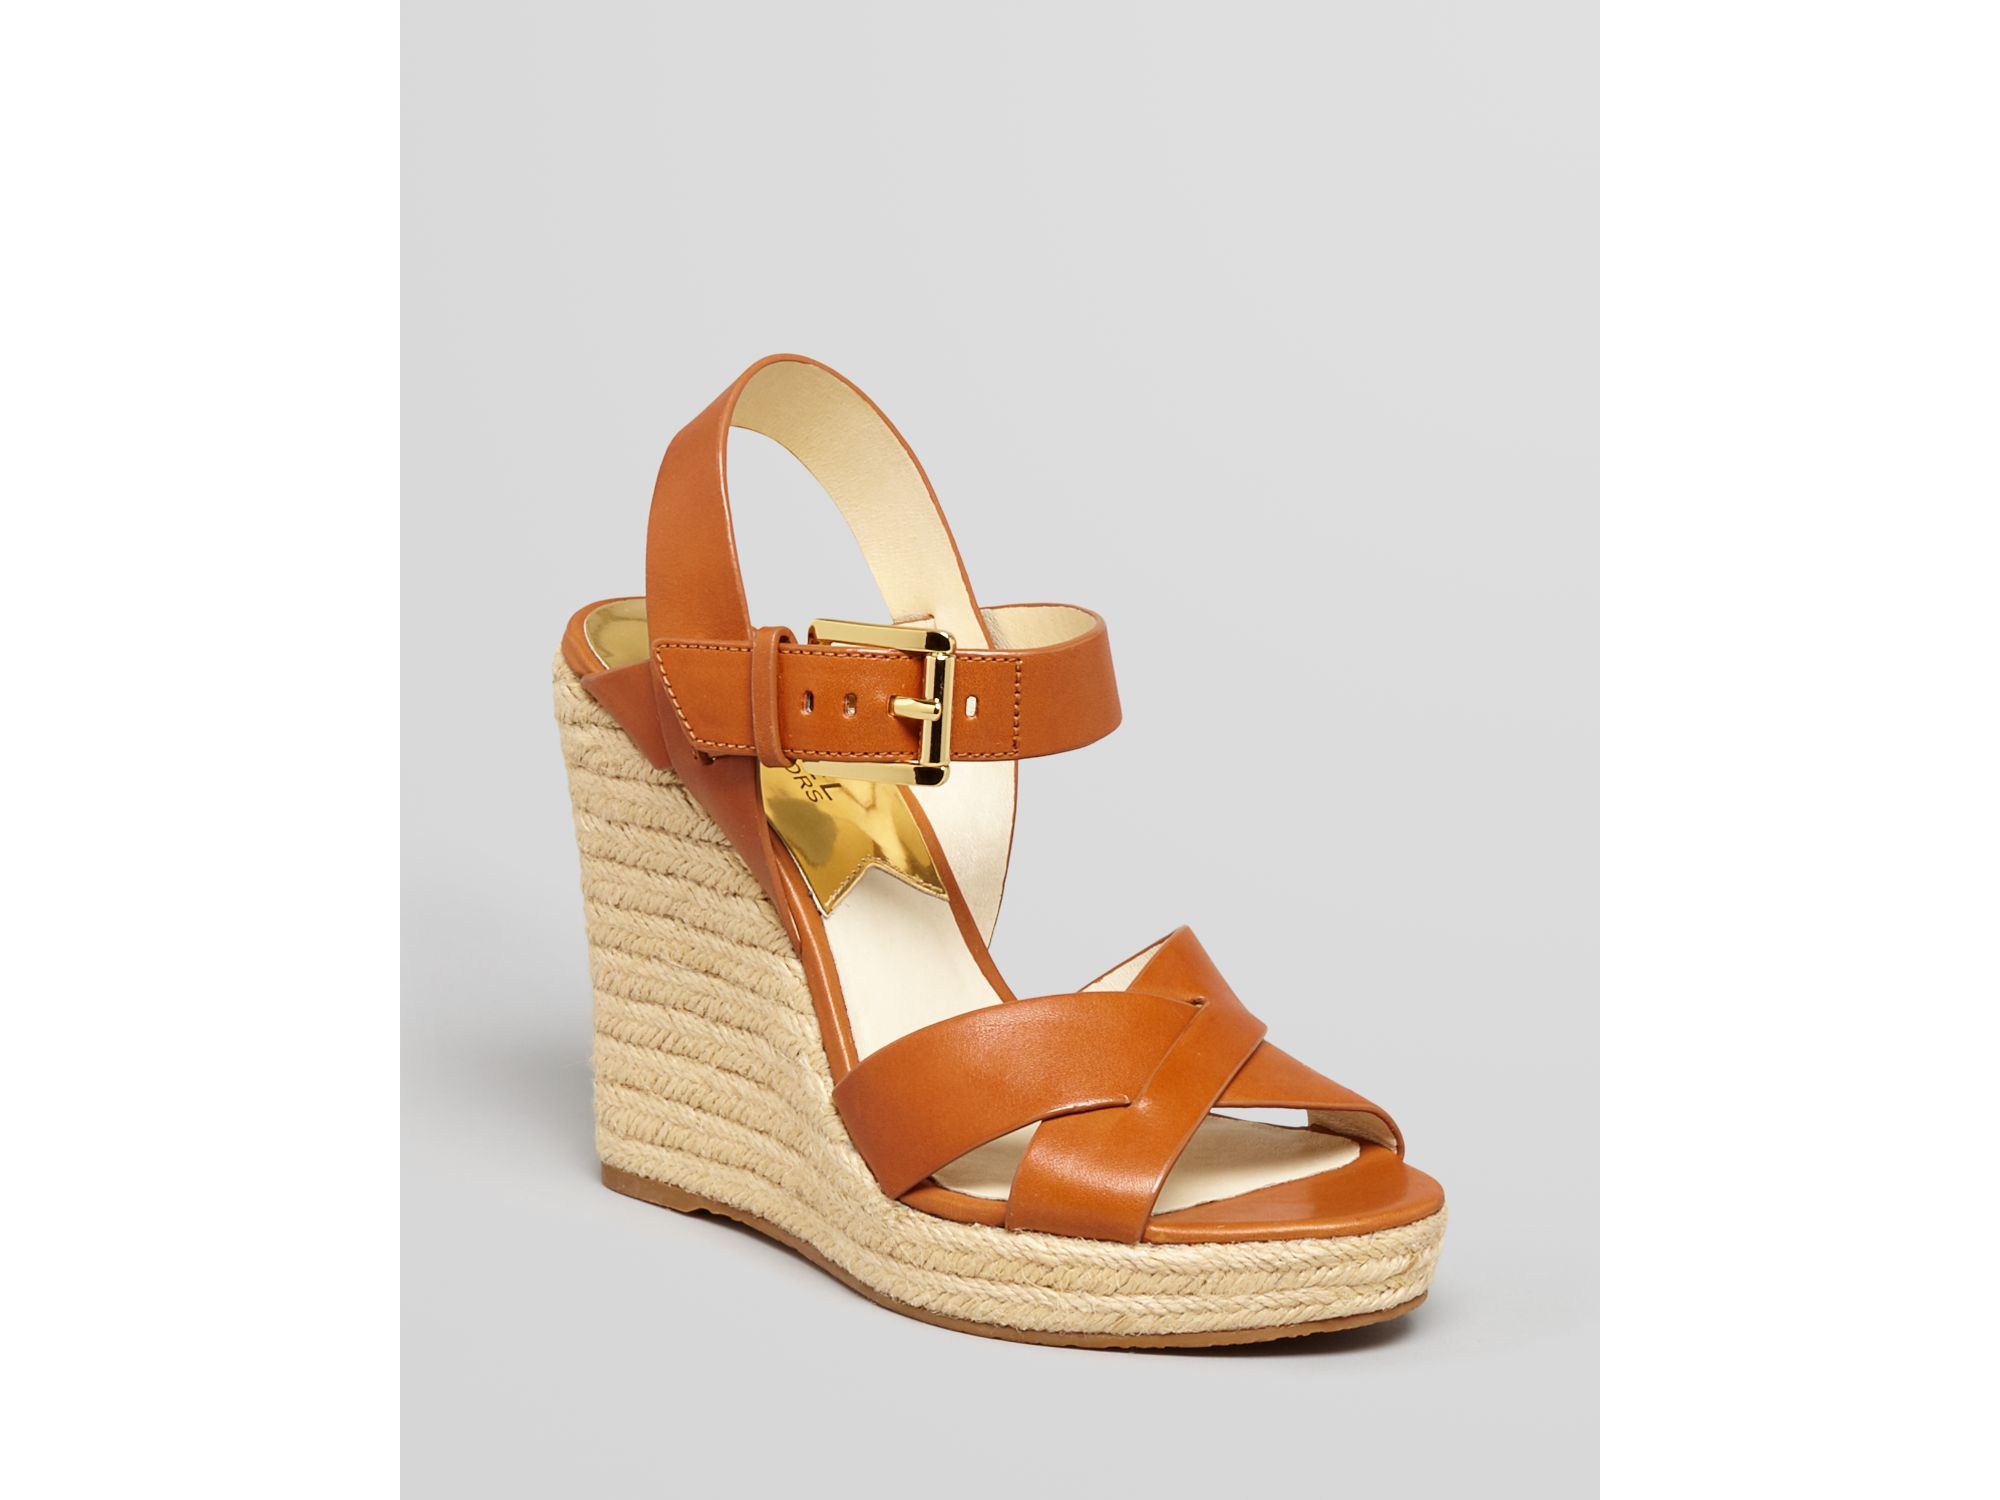 a3e824e6190 MICHAEL Michael Kors Brown Espadrille Platform Wedge Sandals Viola